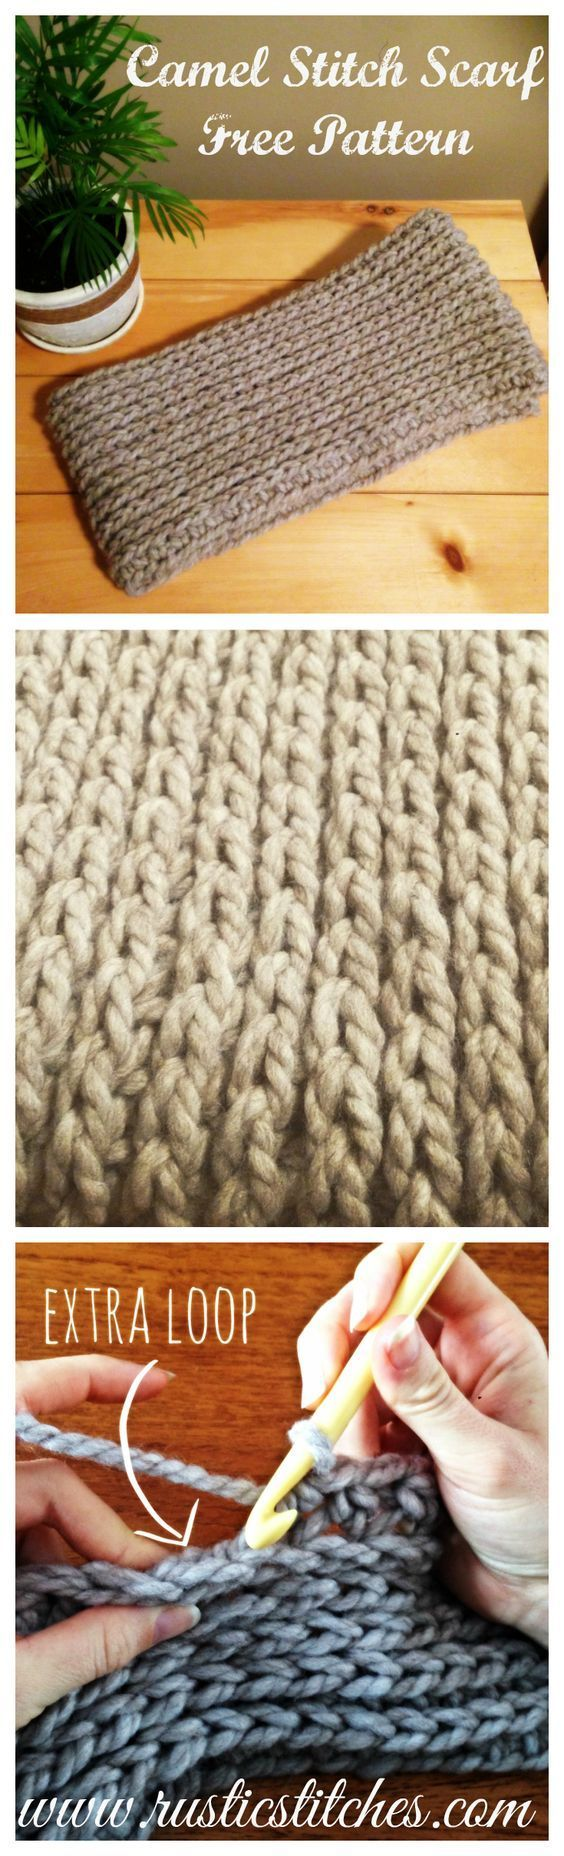 Crochet camel stitch infinity scarf free pattern free pattern crochet camel stitch infinity scarf free pattern bankloansurffo Gallery